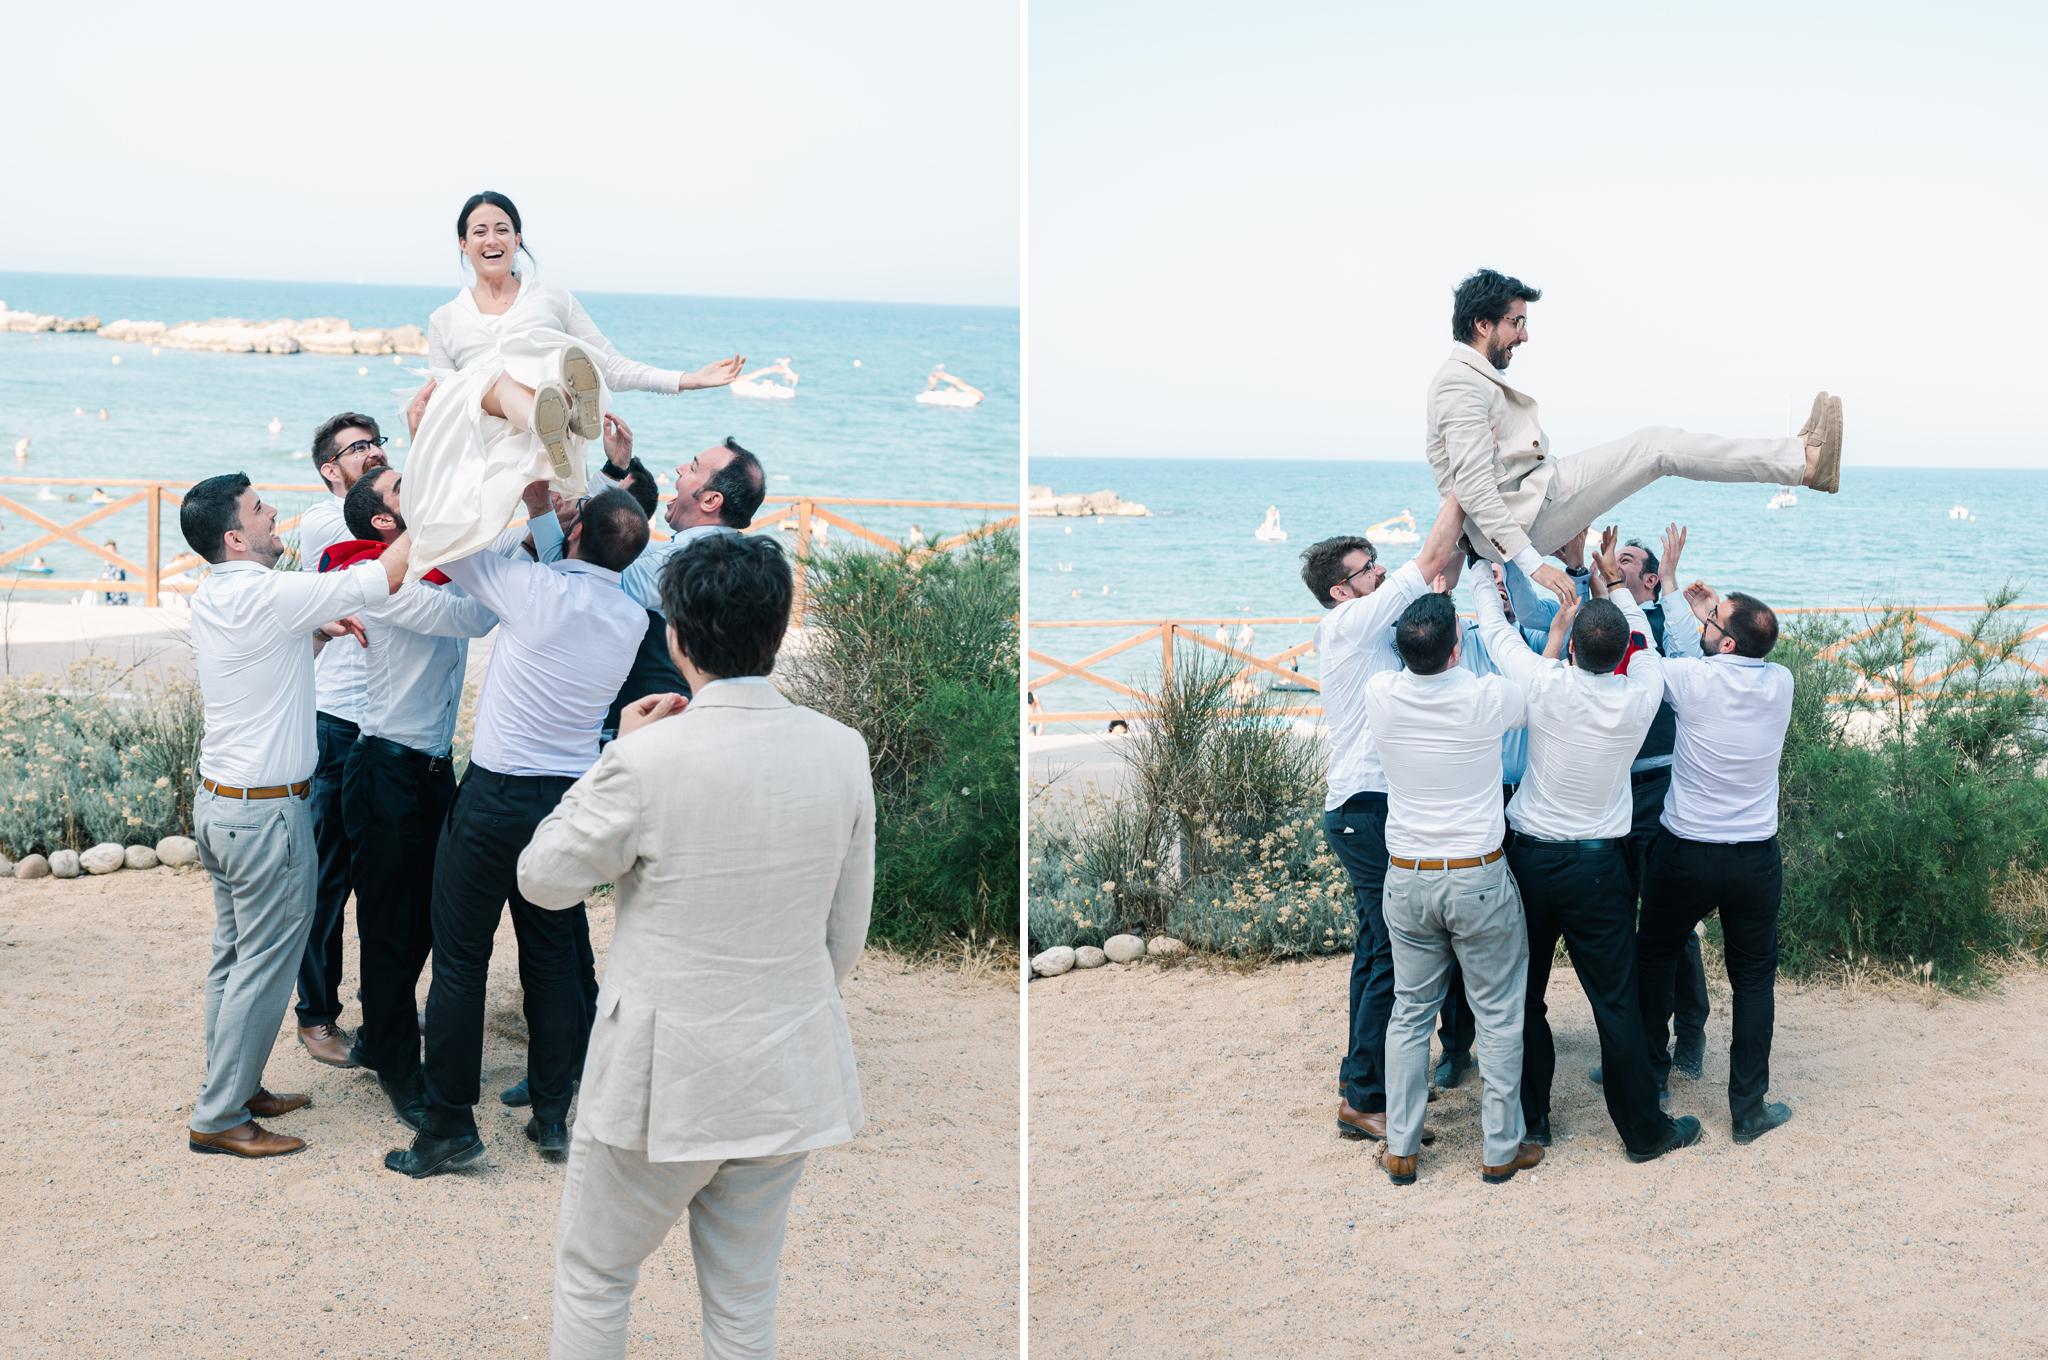 fotografia-boda-mediterraneo068.jpg